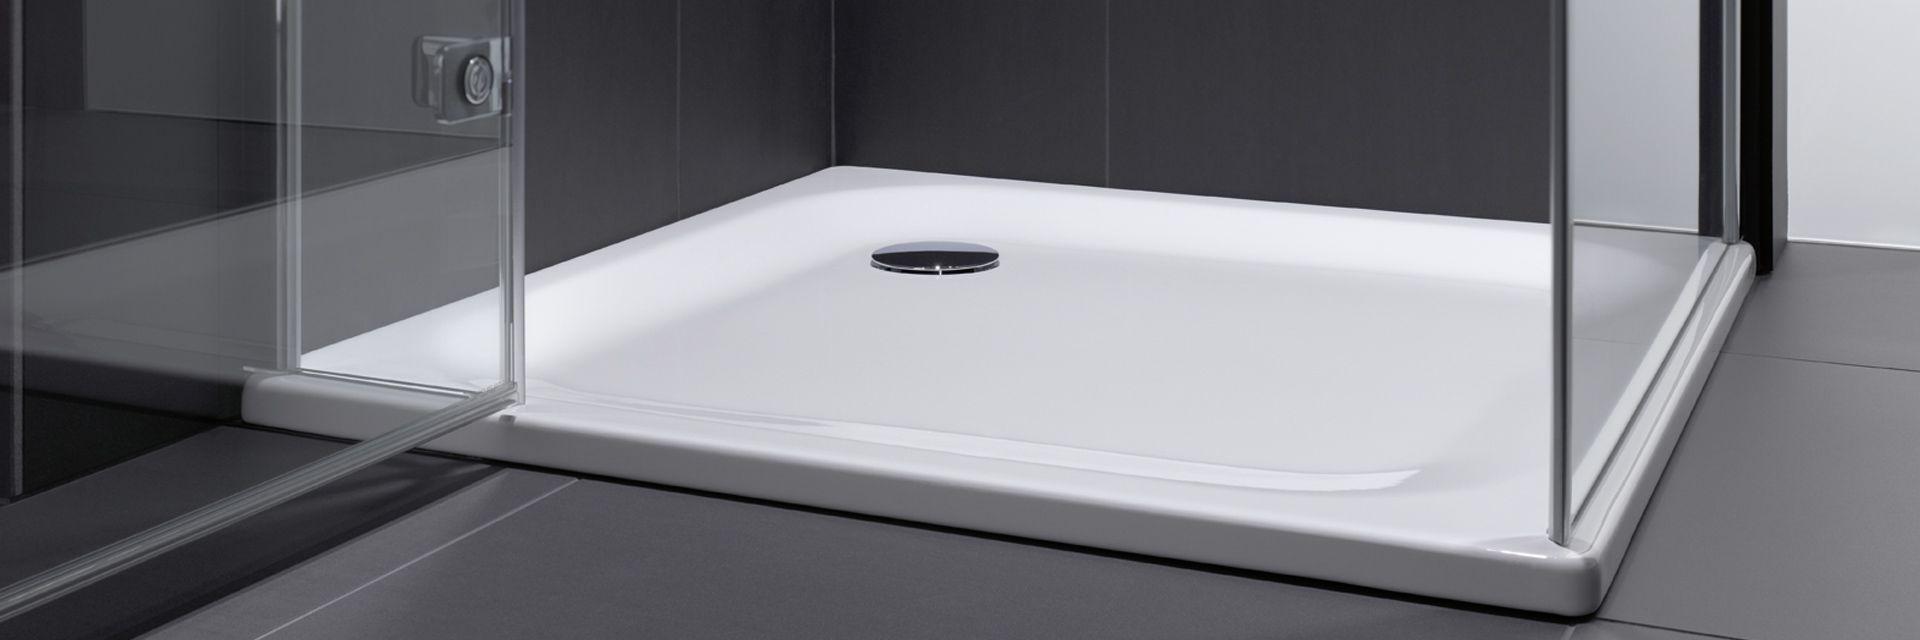 Products - SHOWERING - Rectangular showers - BETTESHOWER TRAYS, DEPTH 2,5/3,5 CM…